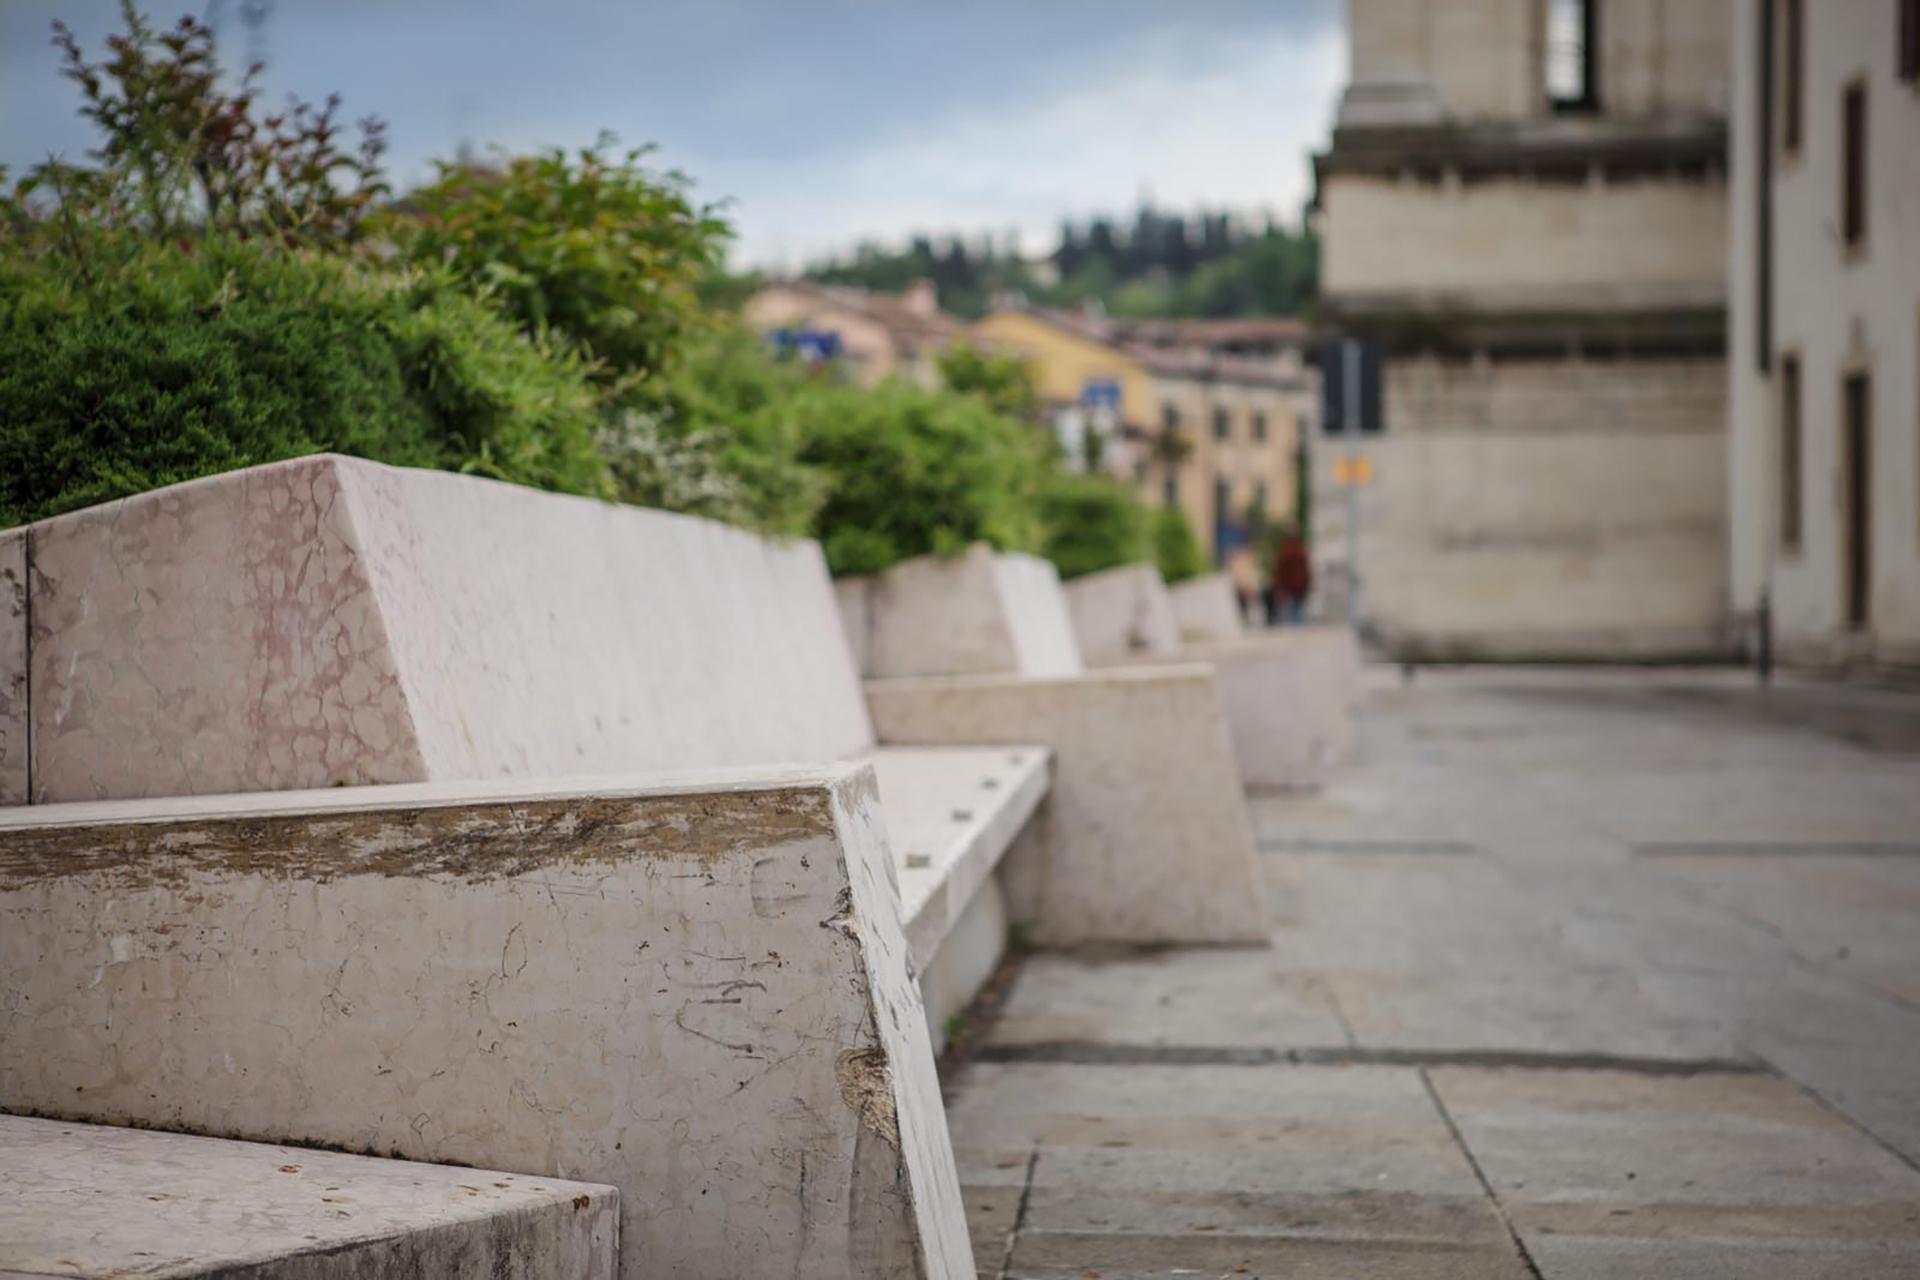 sedute piazzetta San Giorgio in Braida